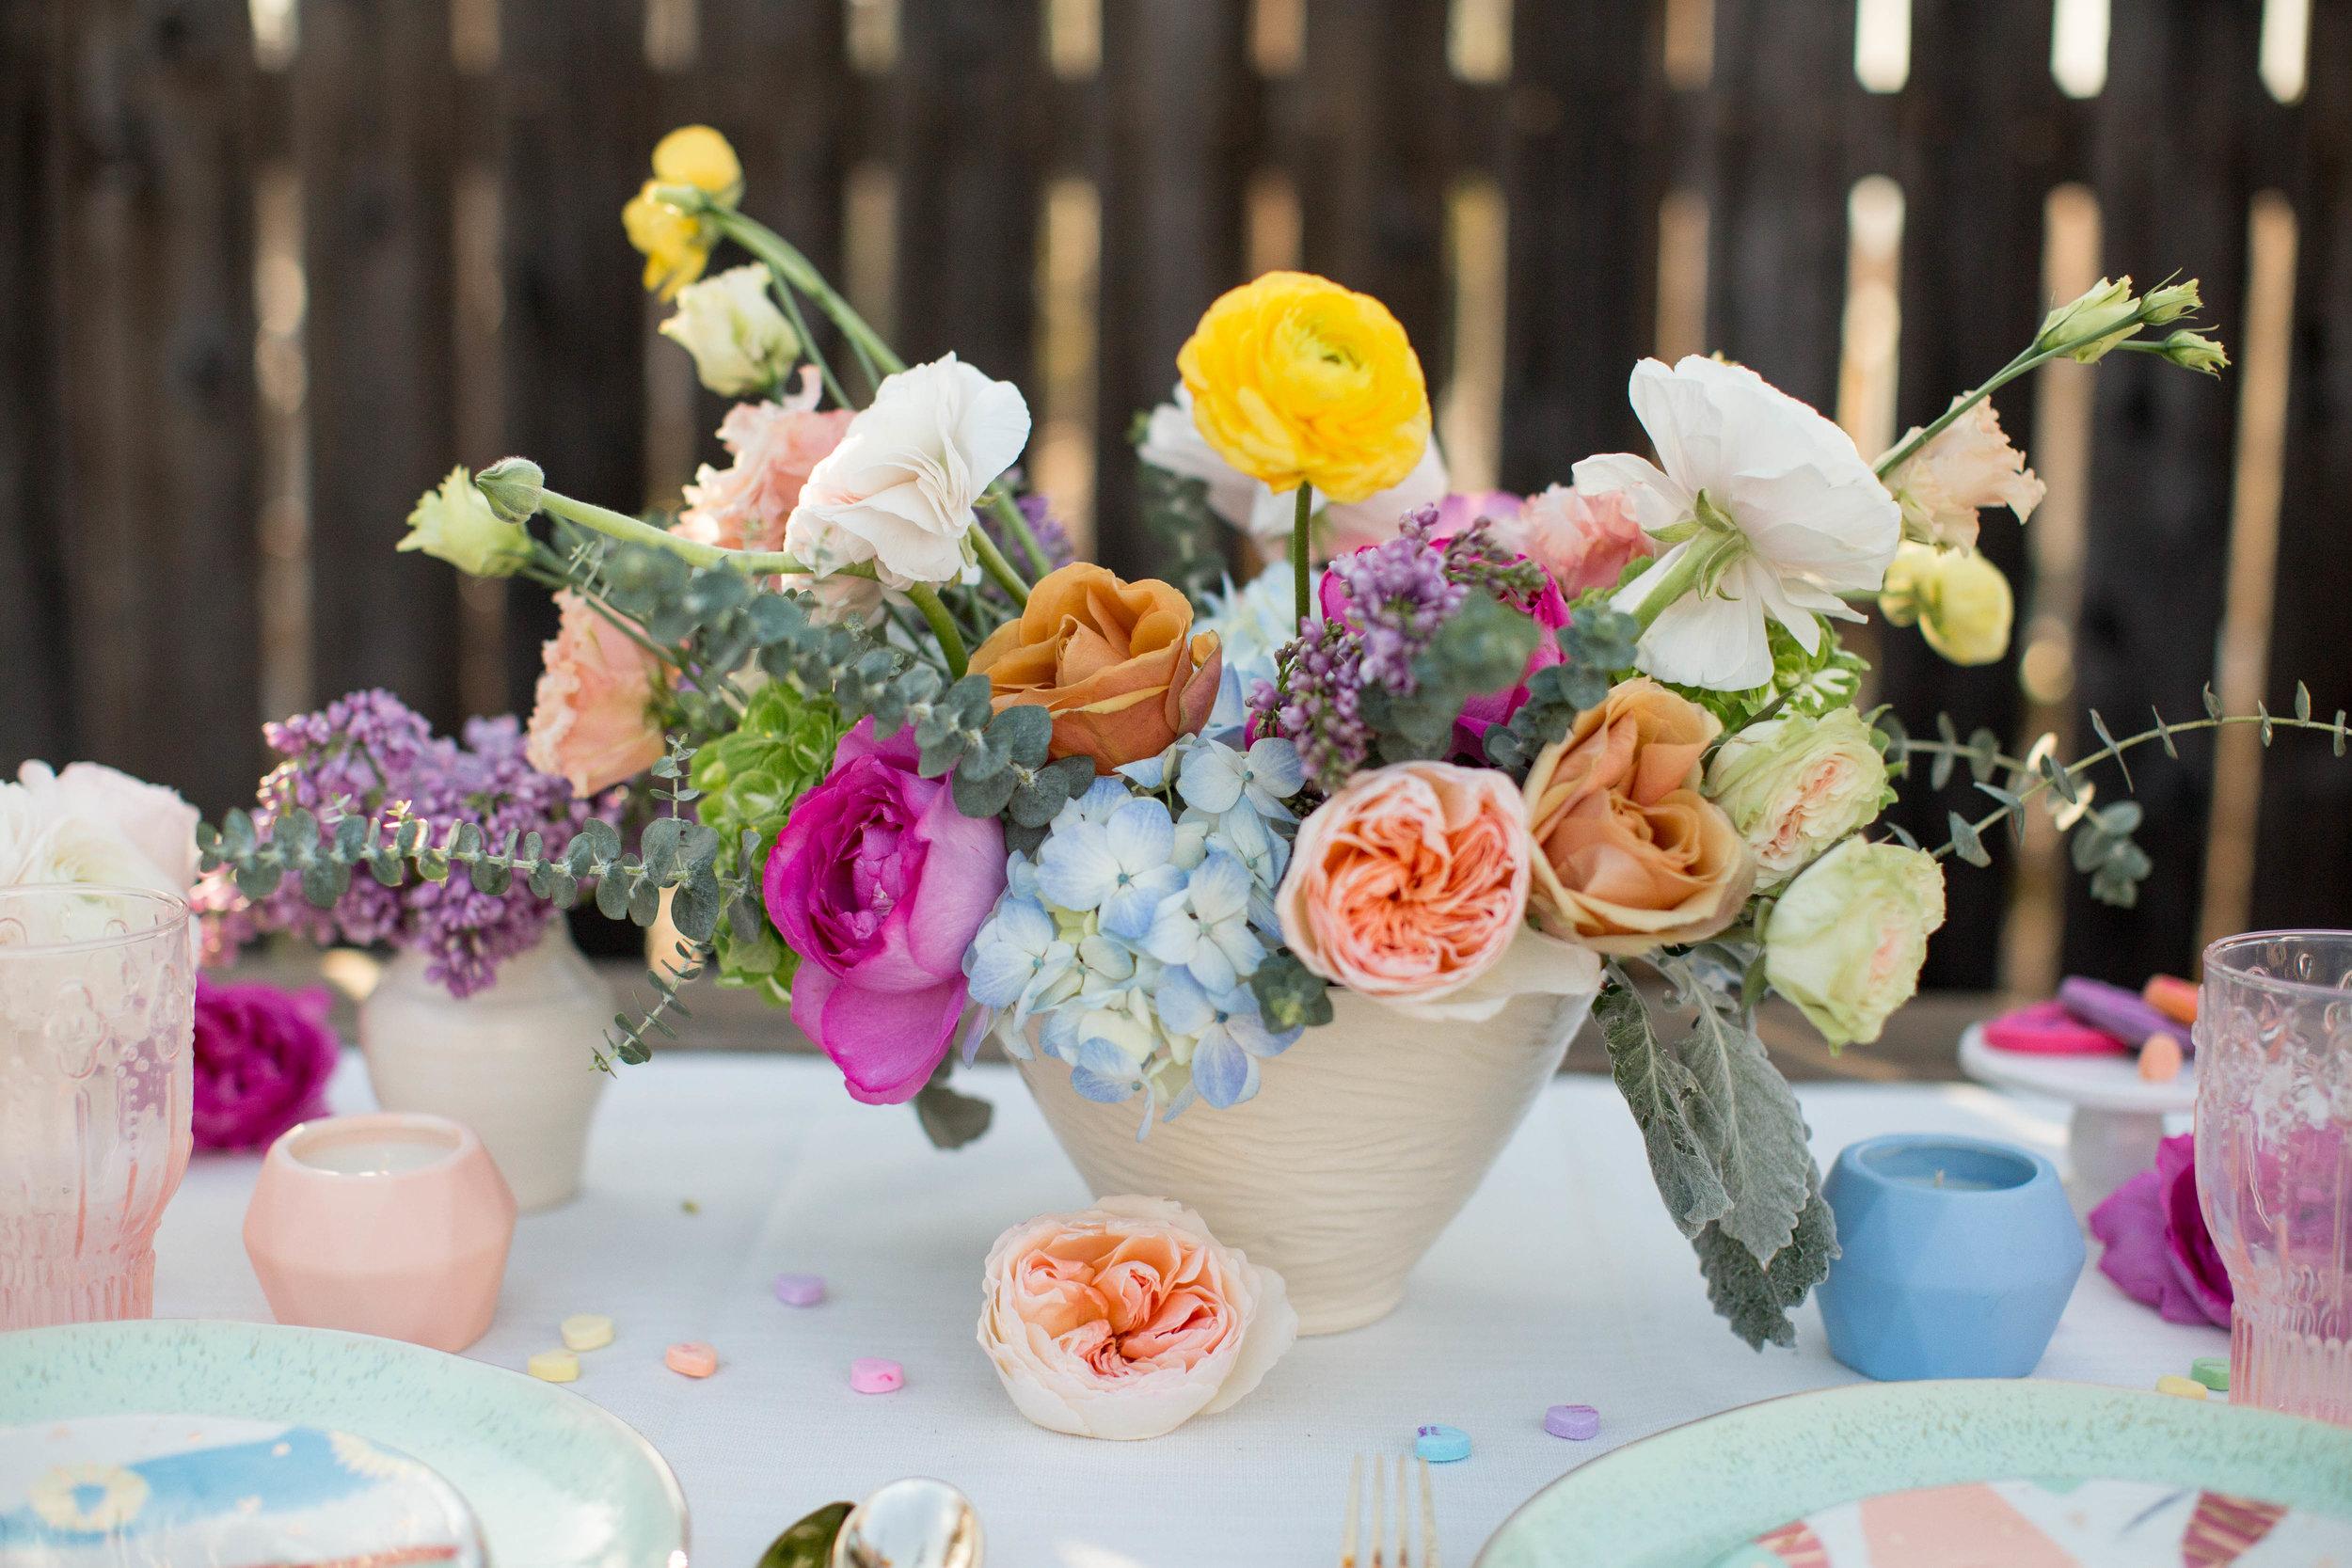 pastel floral centerpiece #lrqcfloral #valentines